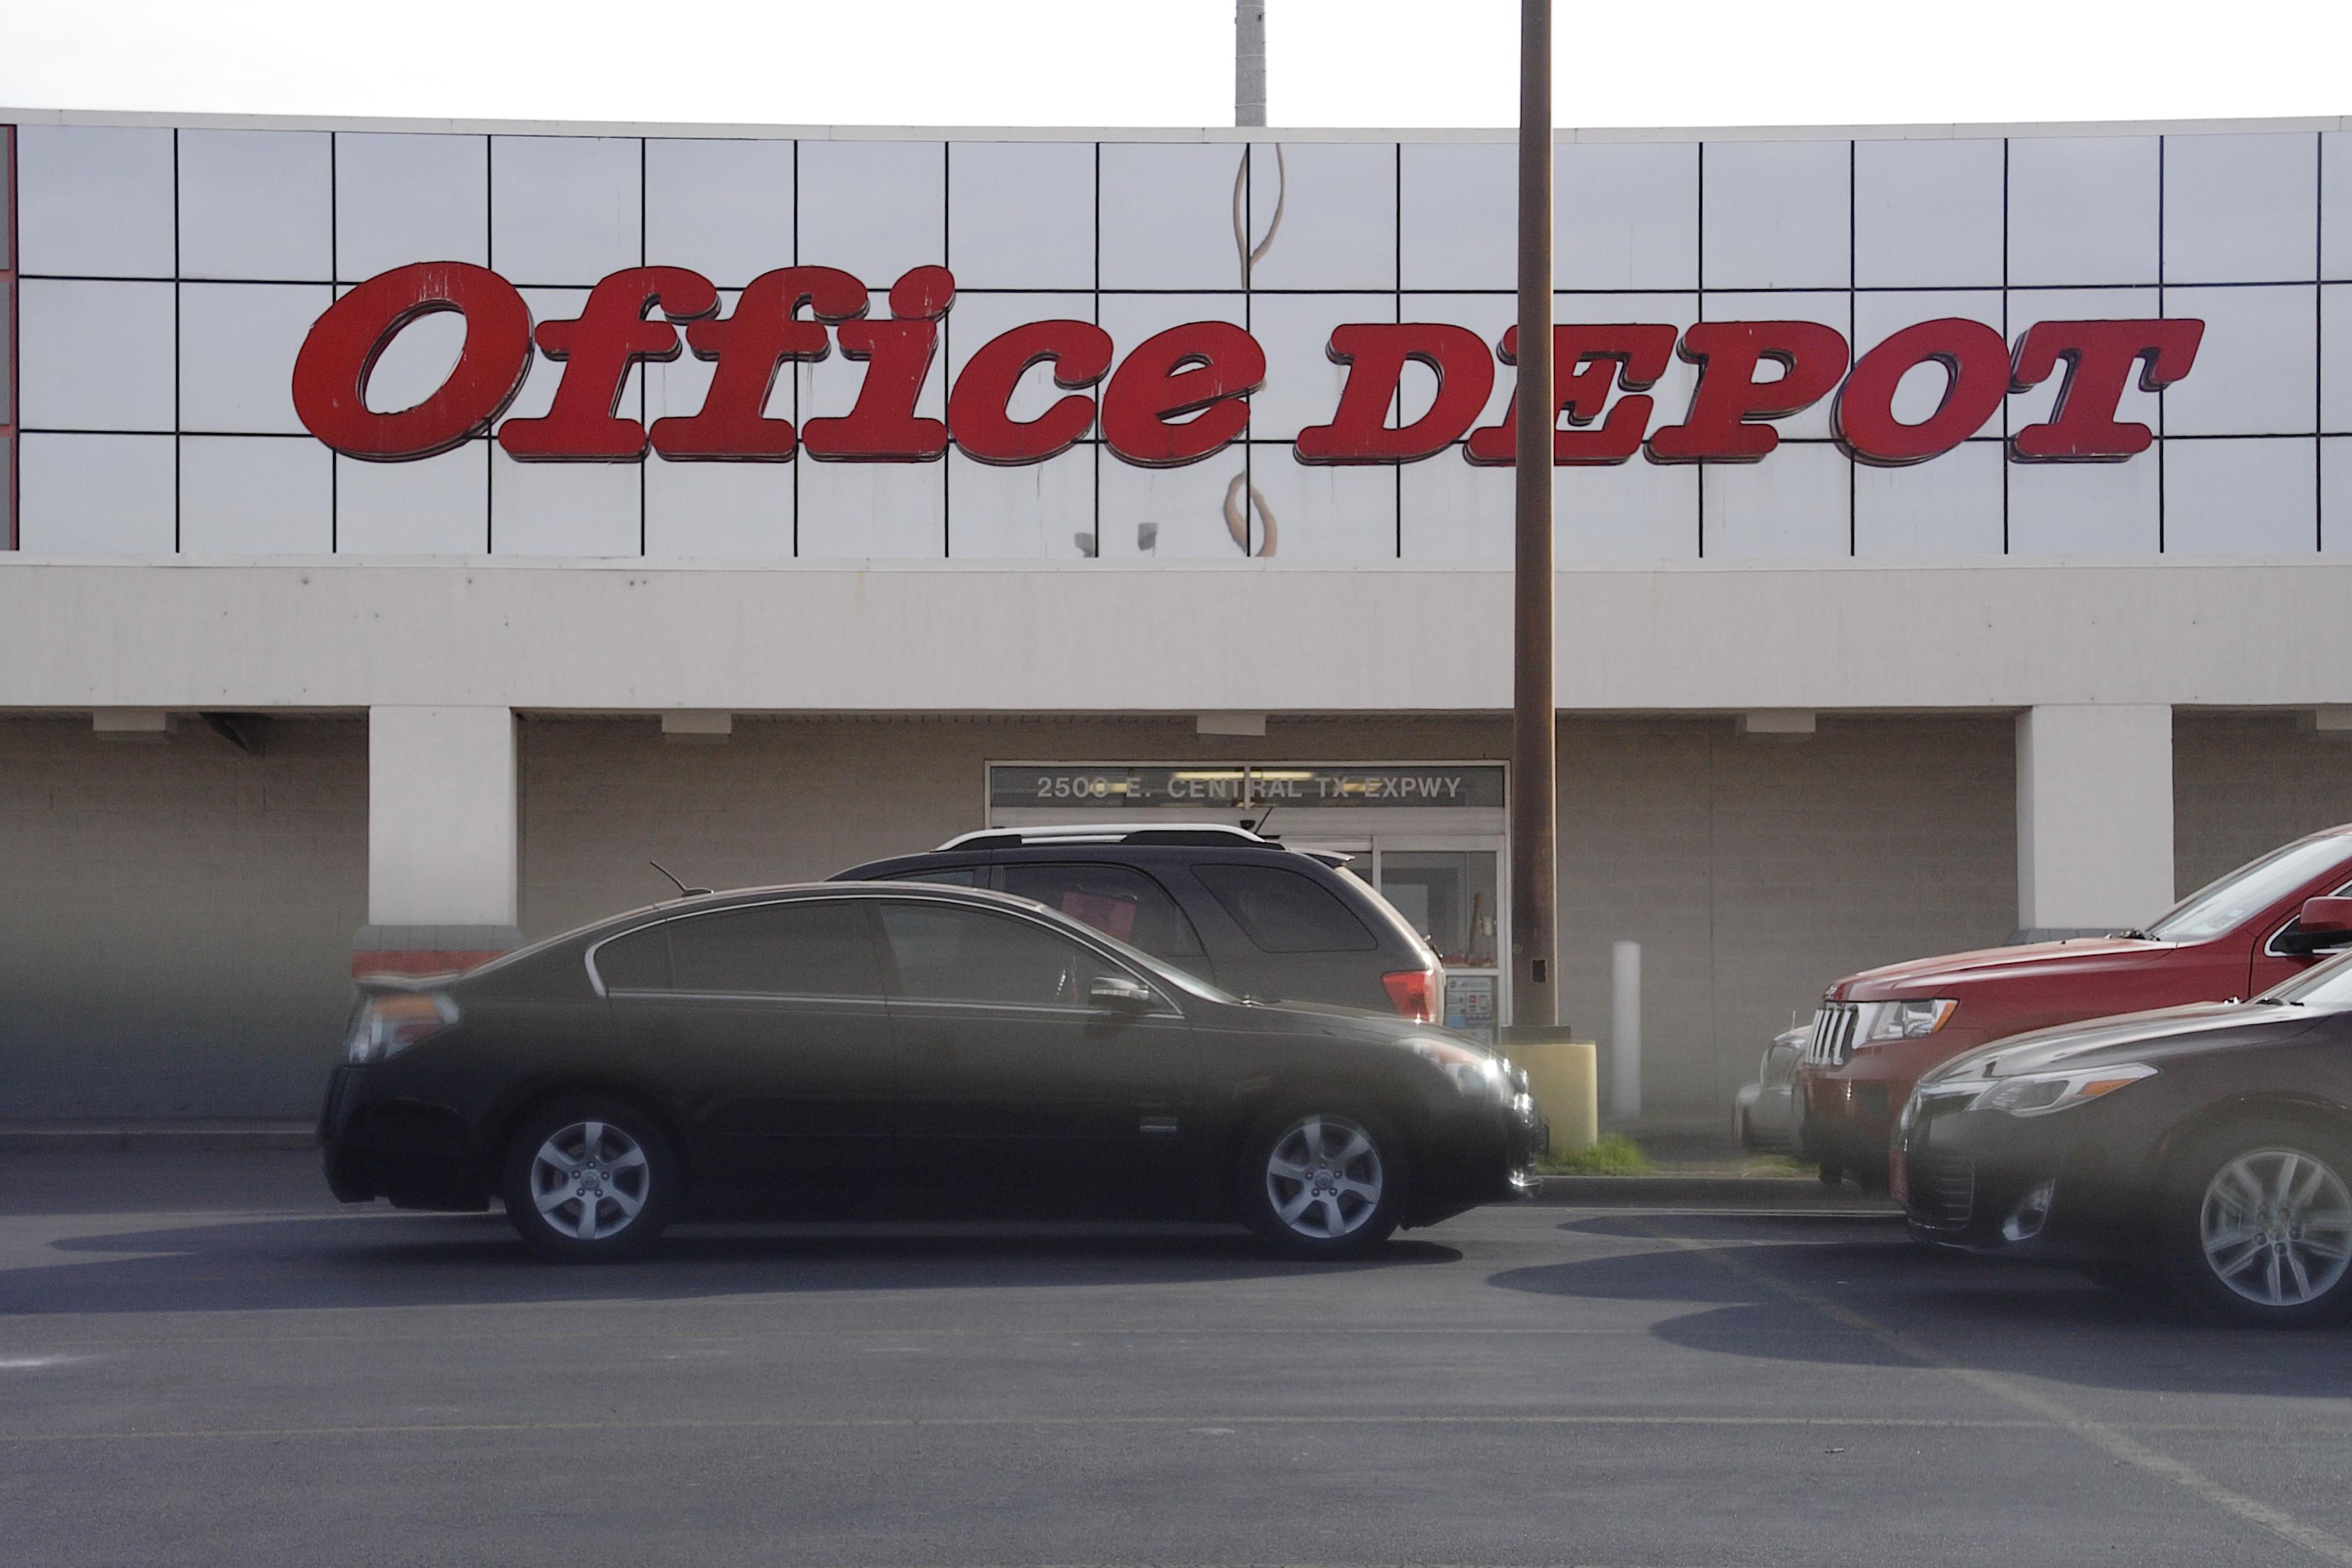 Office depot flickr photo sharing - Office depot saint gregoire ...